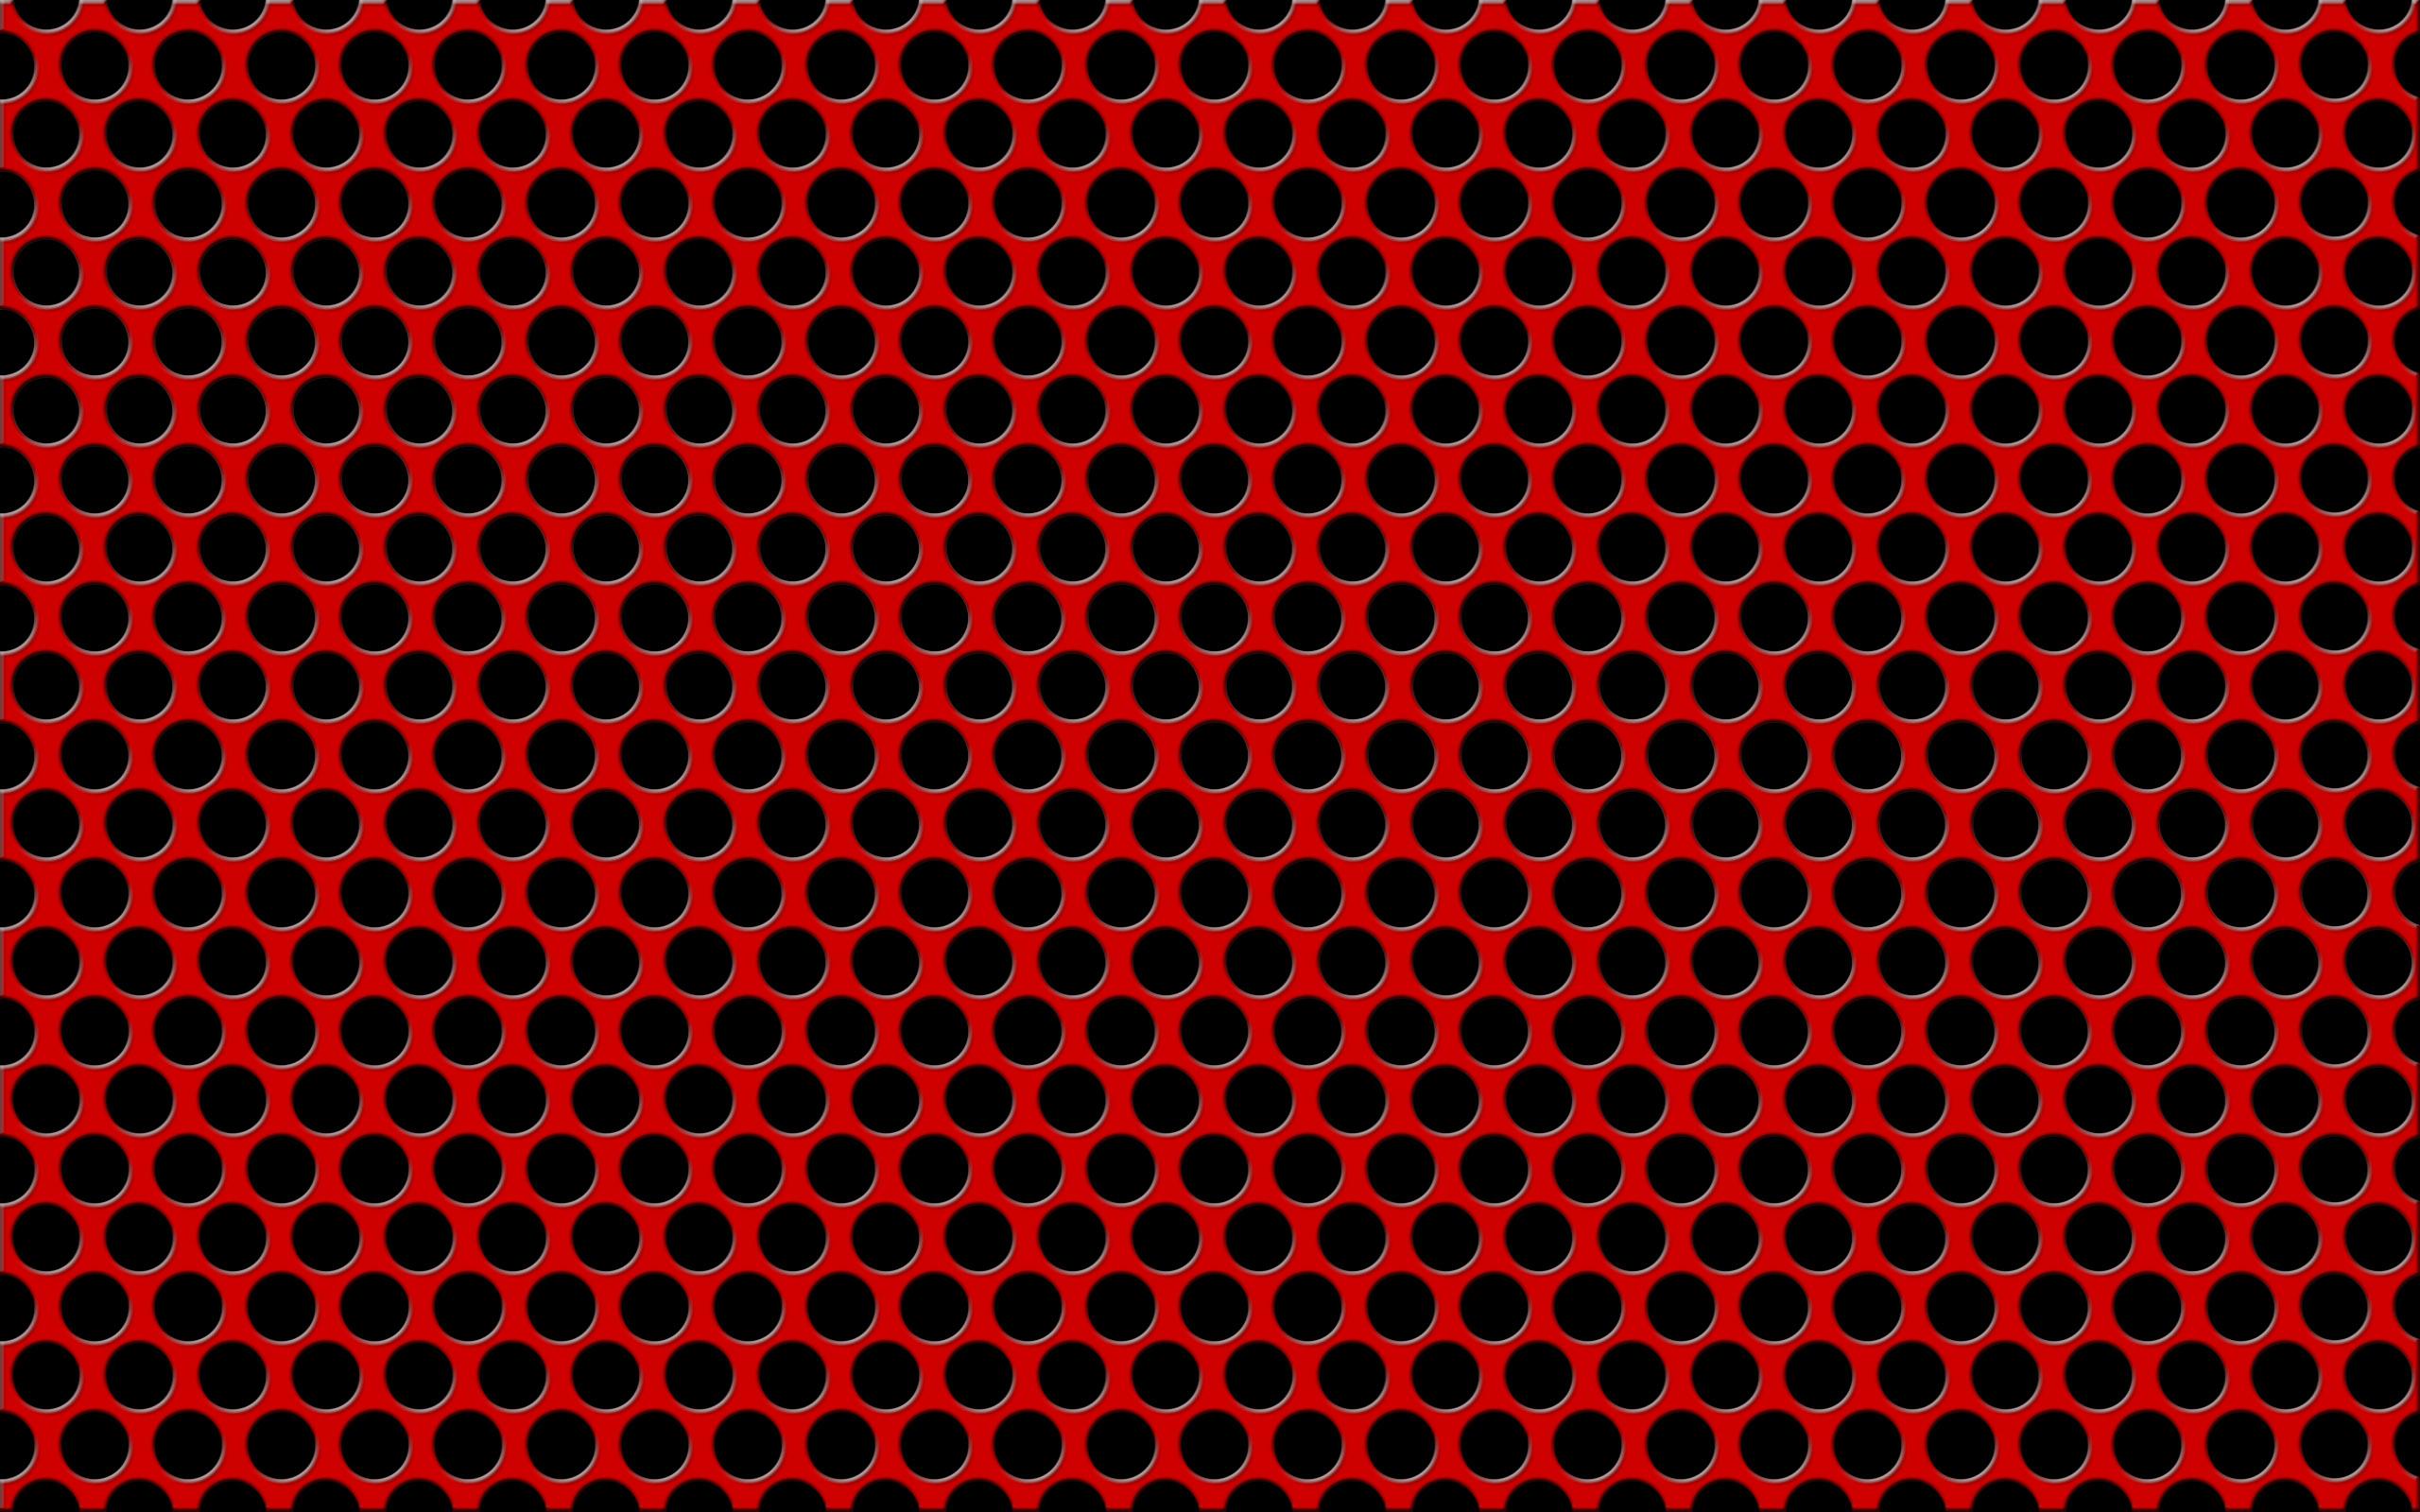 Red and Black Wallpapers red and black wallpapers Widescreen 2560x1600